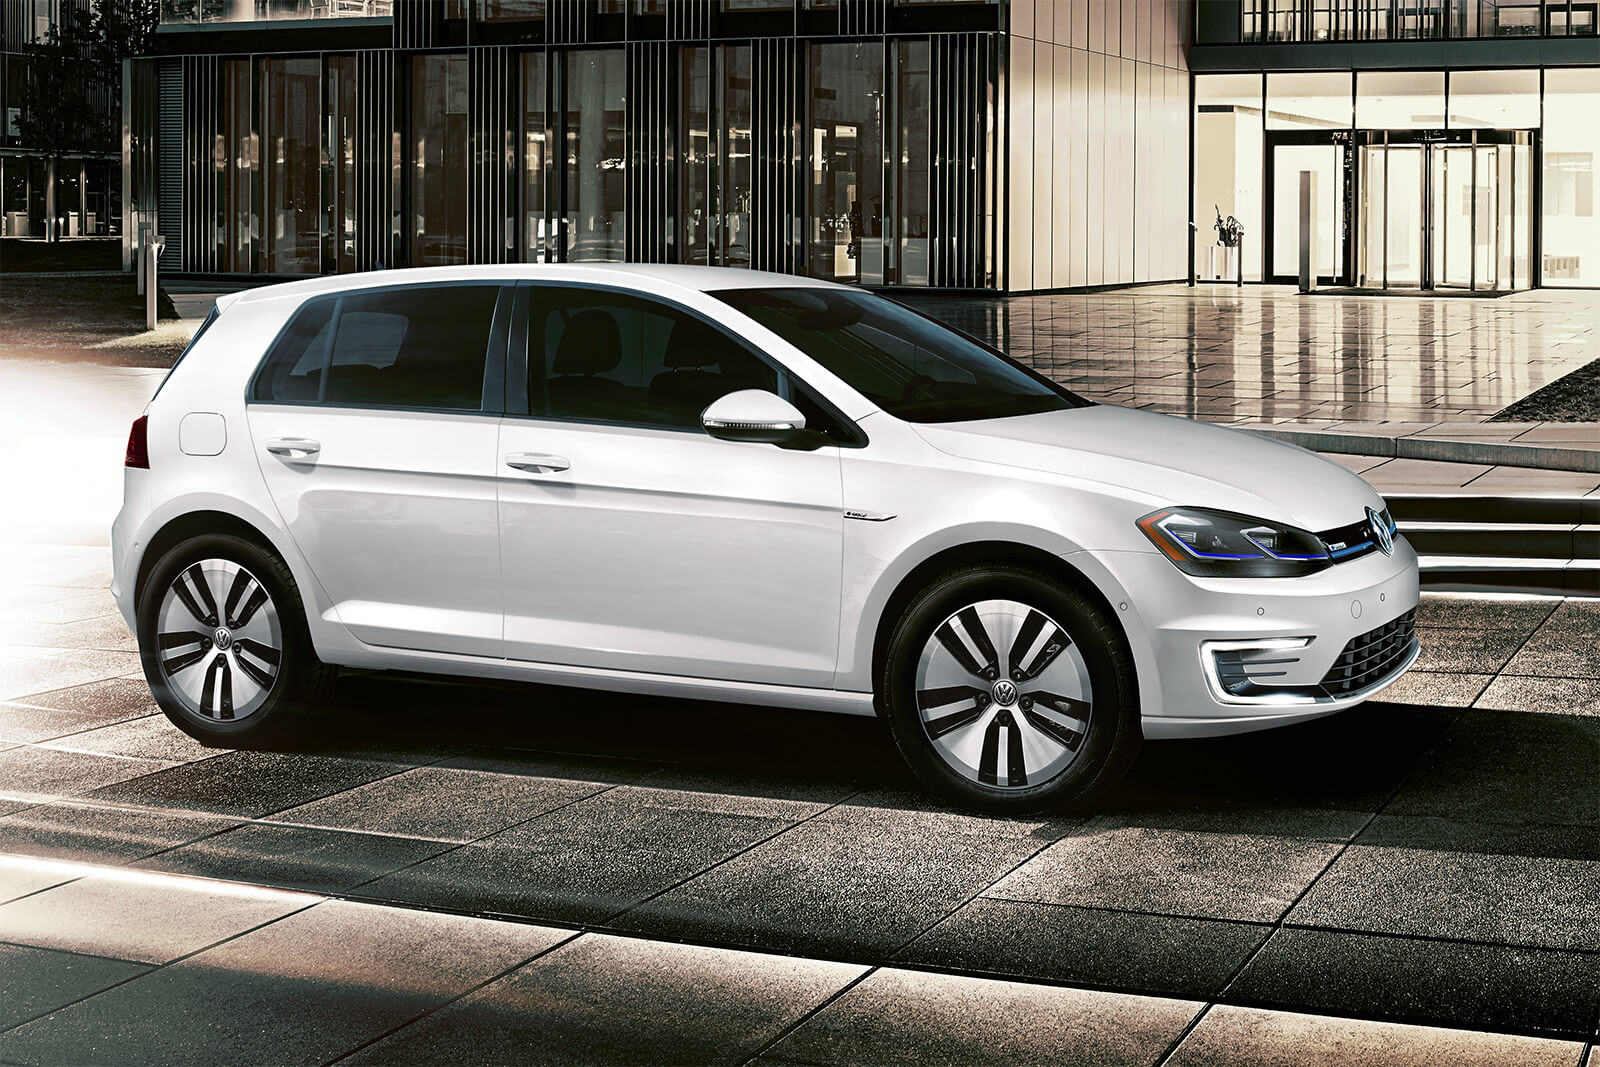 Volkswagen e-Golf 2019 a la venta cerca de Washington, DC